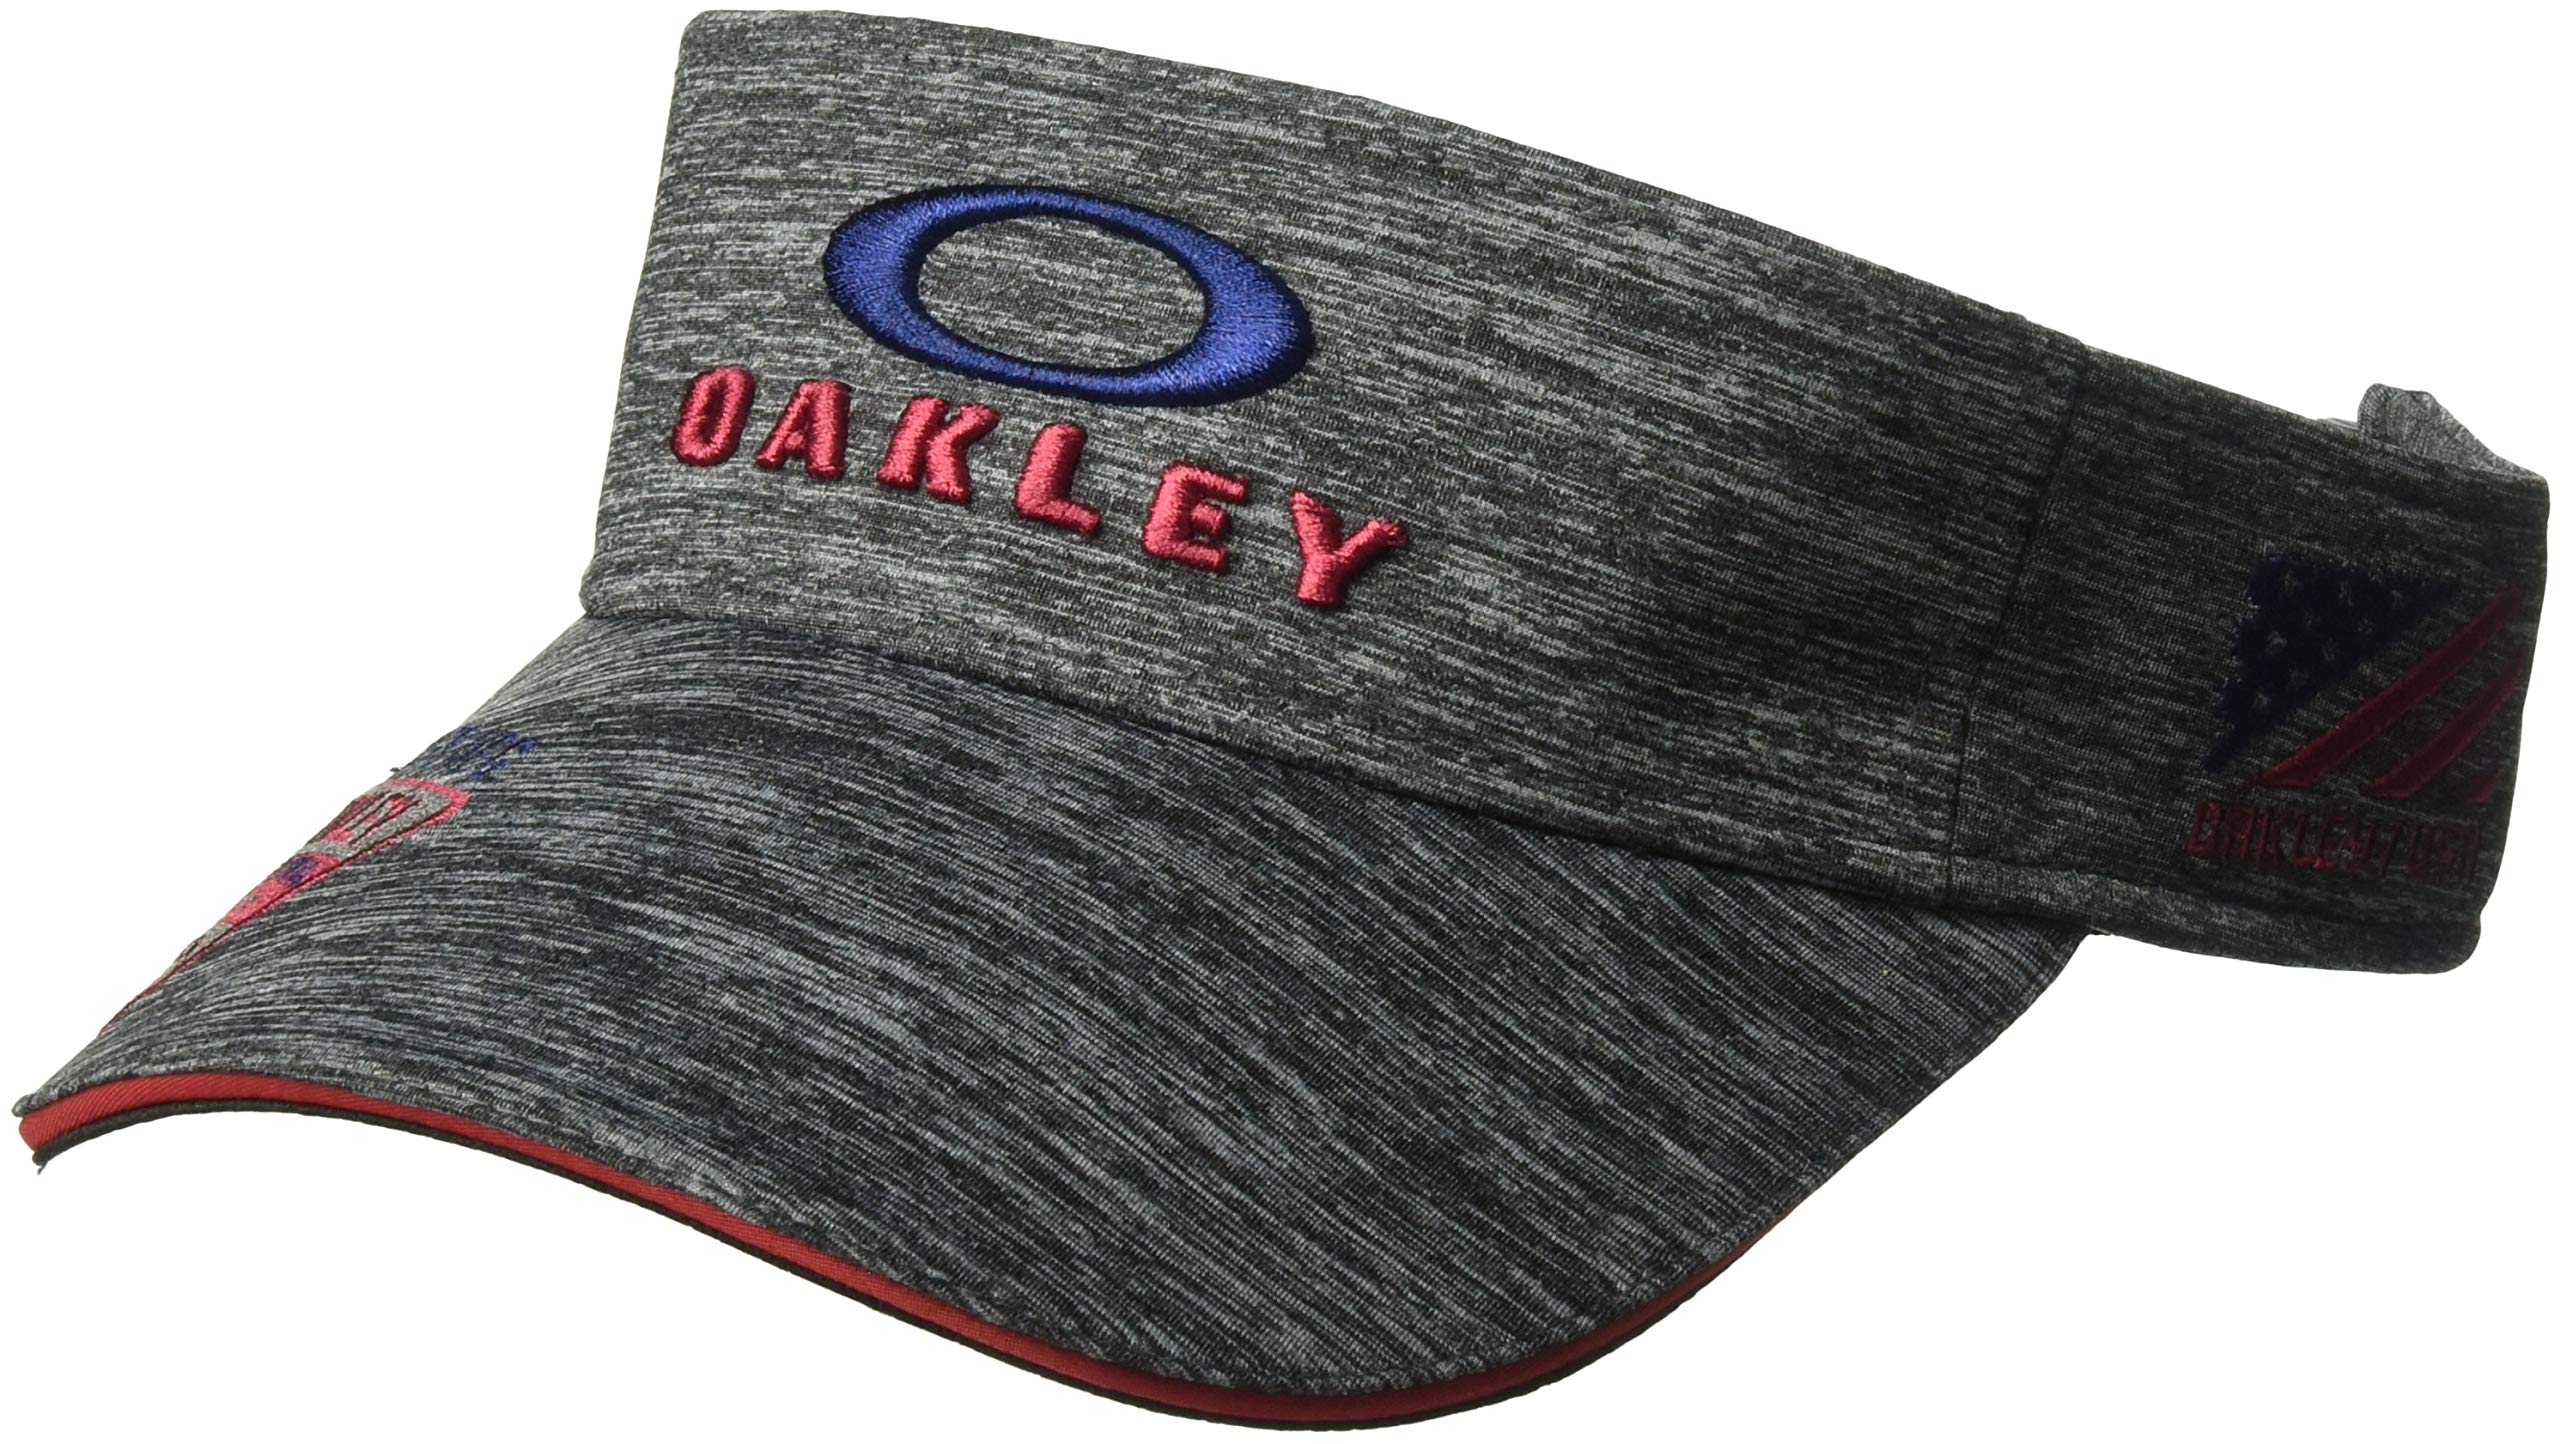 Oakley Men's Bg Emb Visor, Granite Heather, One Size by Oakley